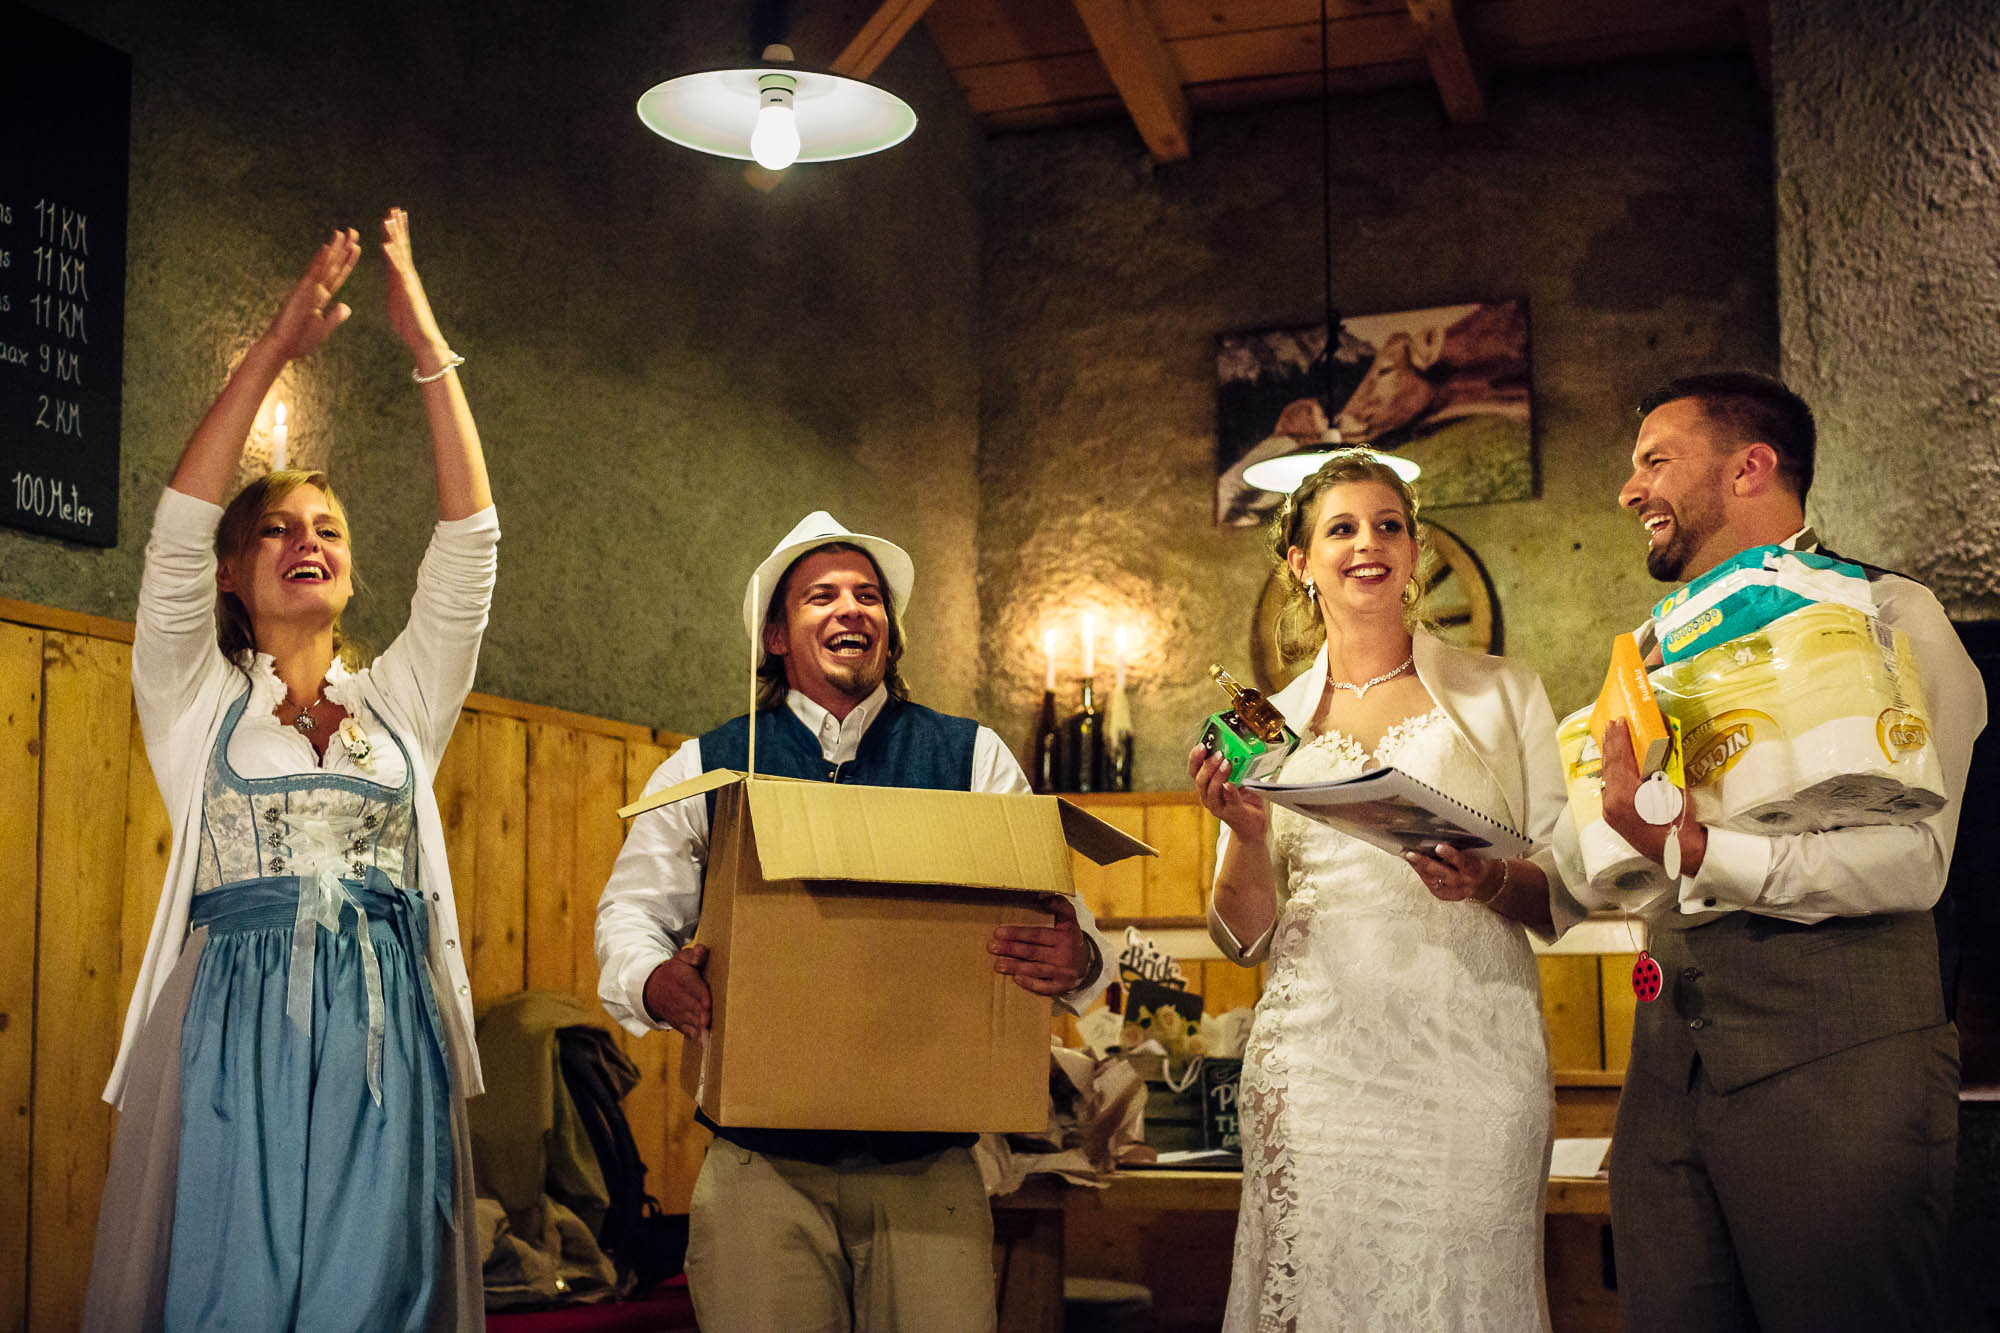 Brautpaar bekommt lustige Geschenke